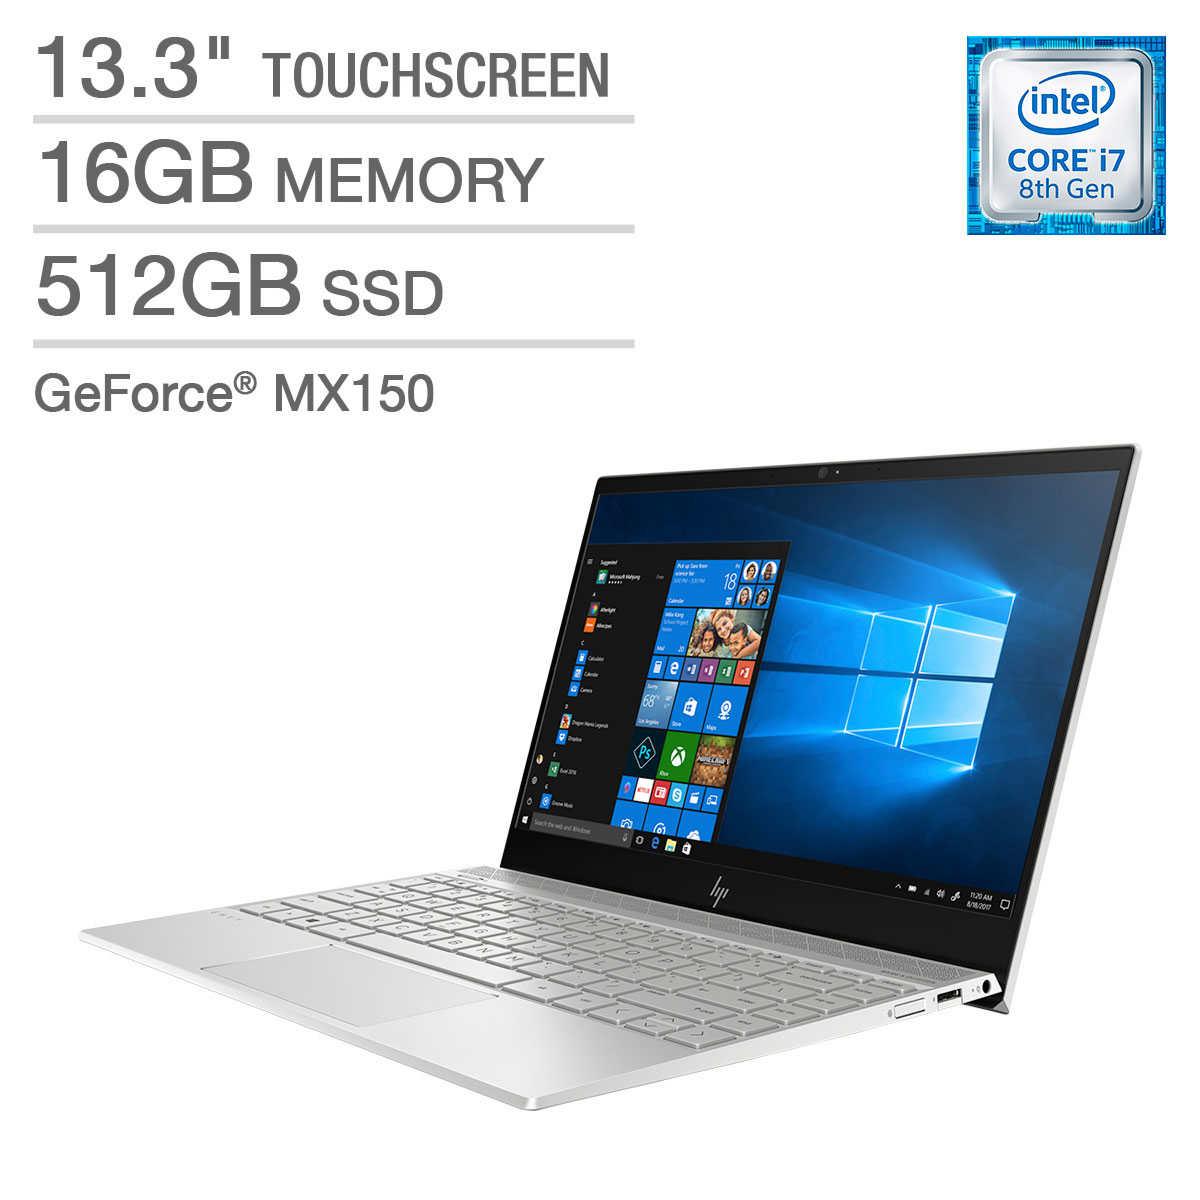 HP ENVY 13 Touchscreen Laptop - Intel Core i7 - GeForce MX150 - 4K Ultra HD